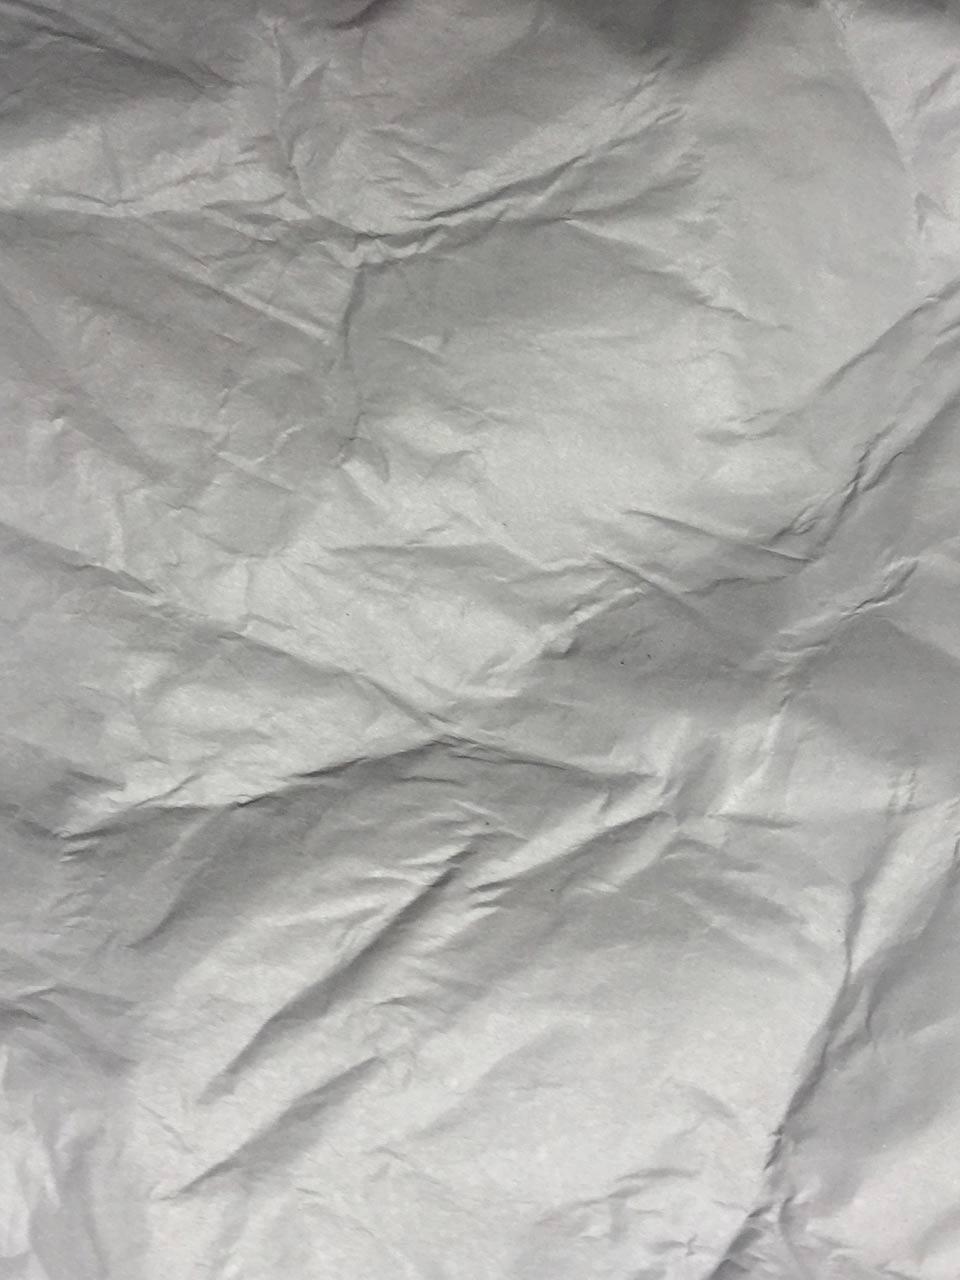 cuir façon papier gonflé FC CREACIO INNOVACIO